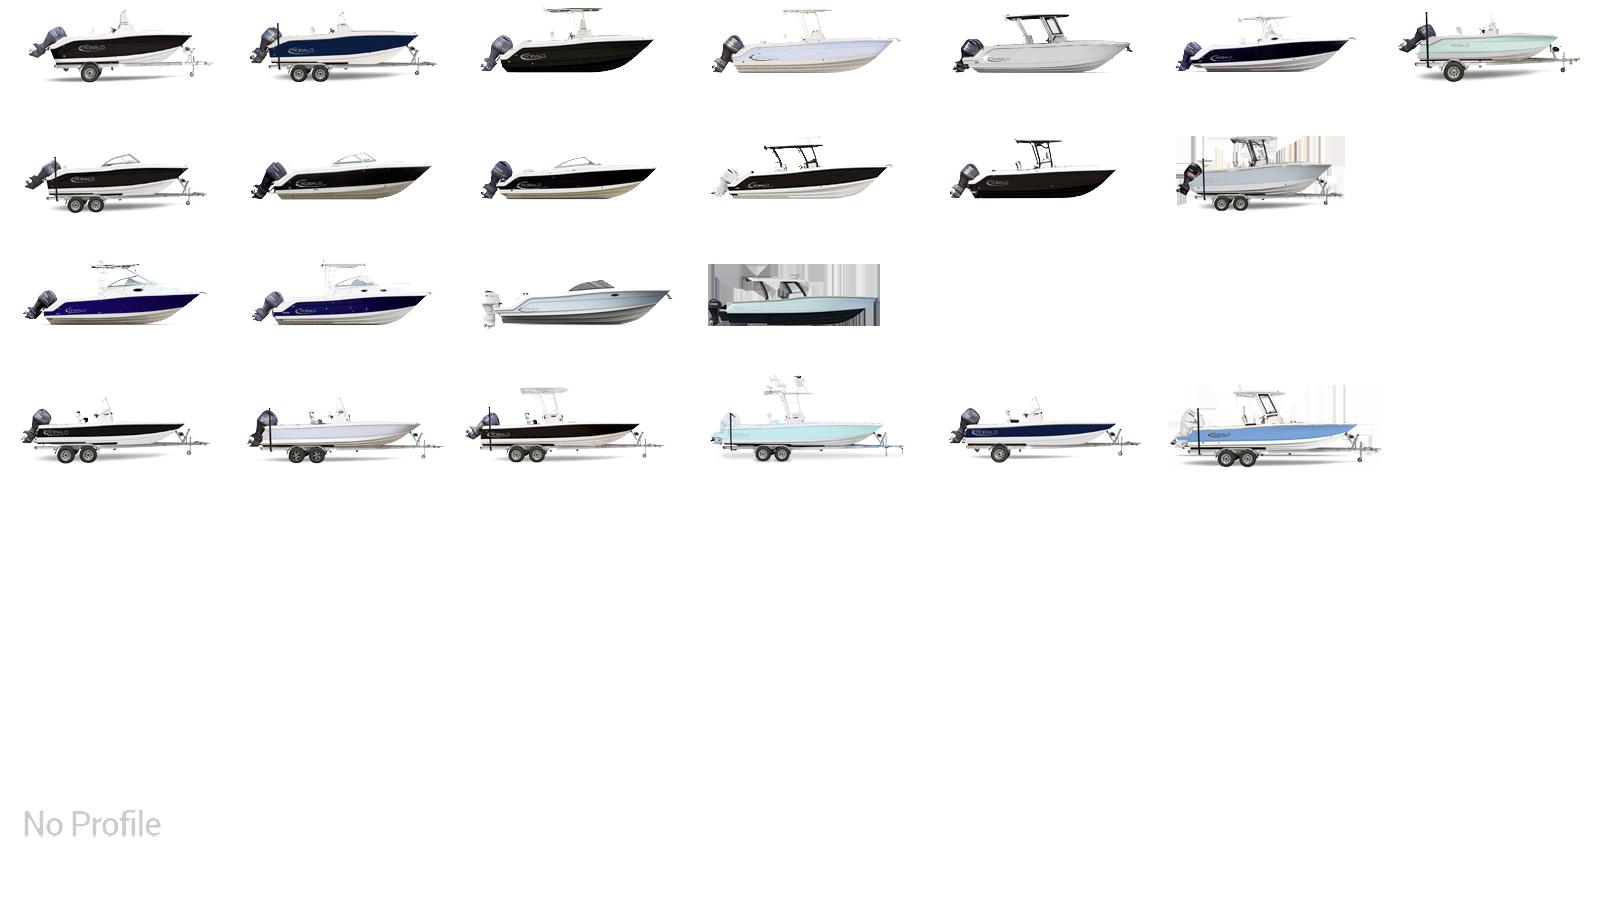 R242 profile image